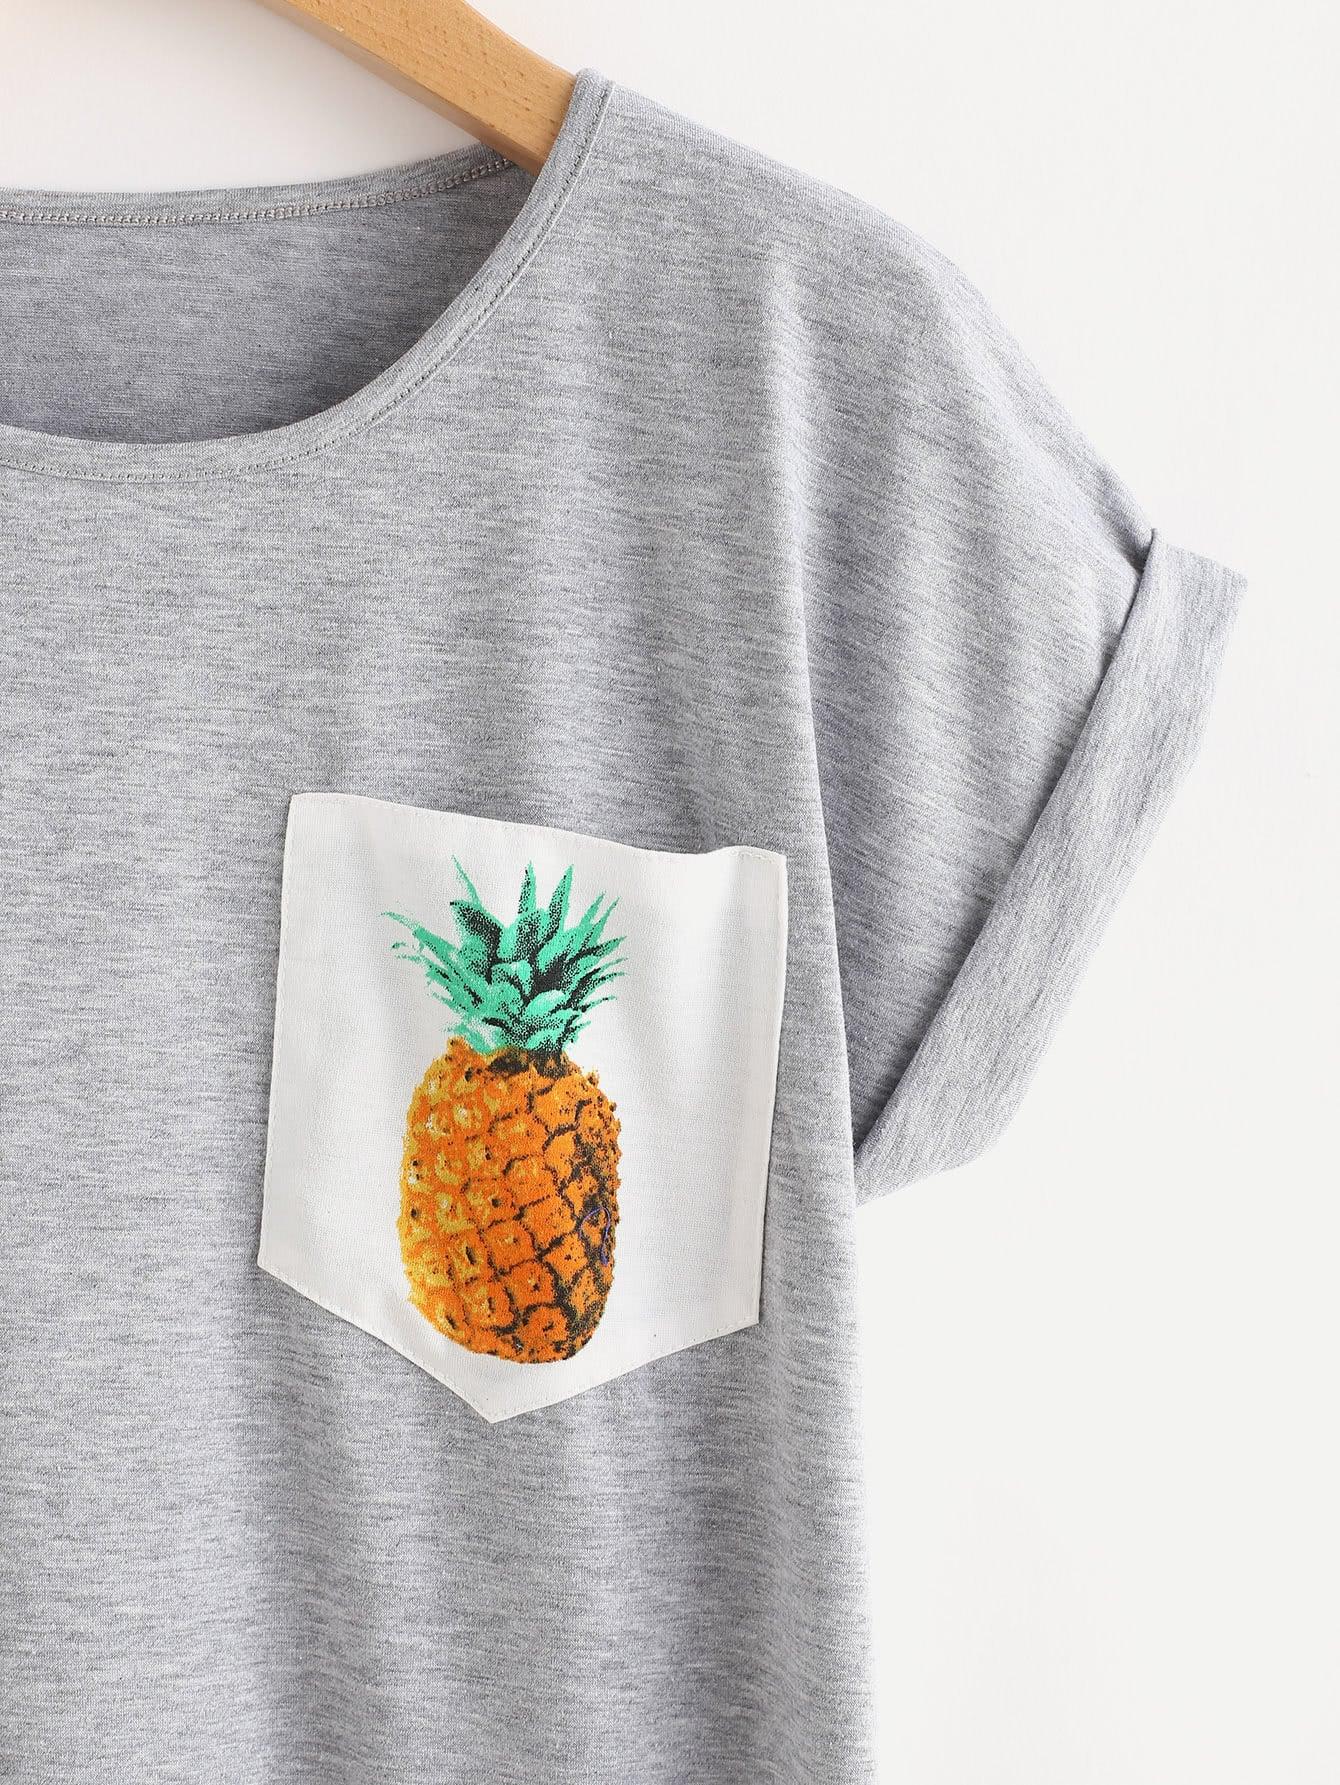 Space Dye Pineapple Print Cuffed Tee